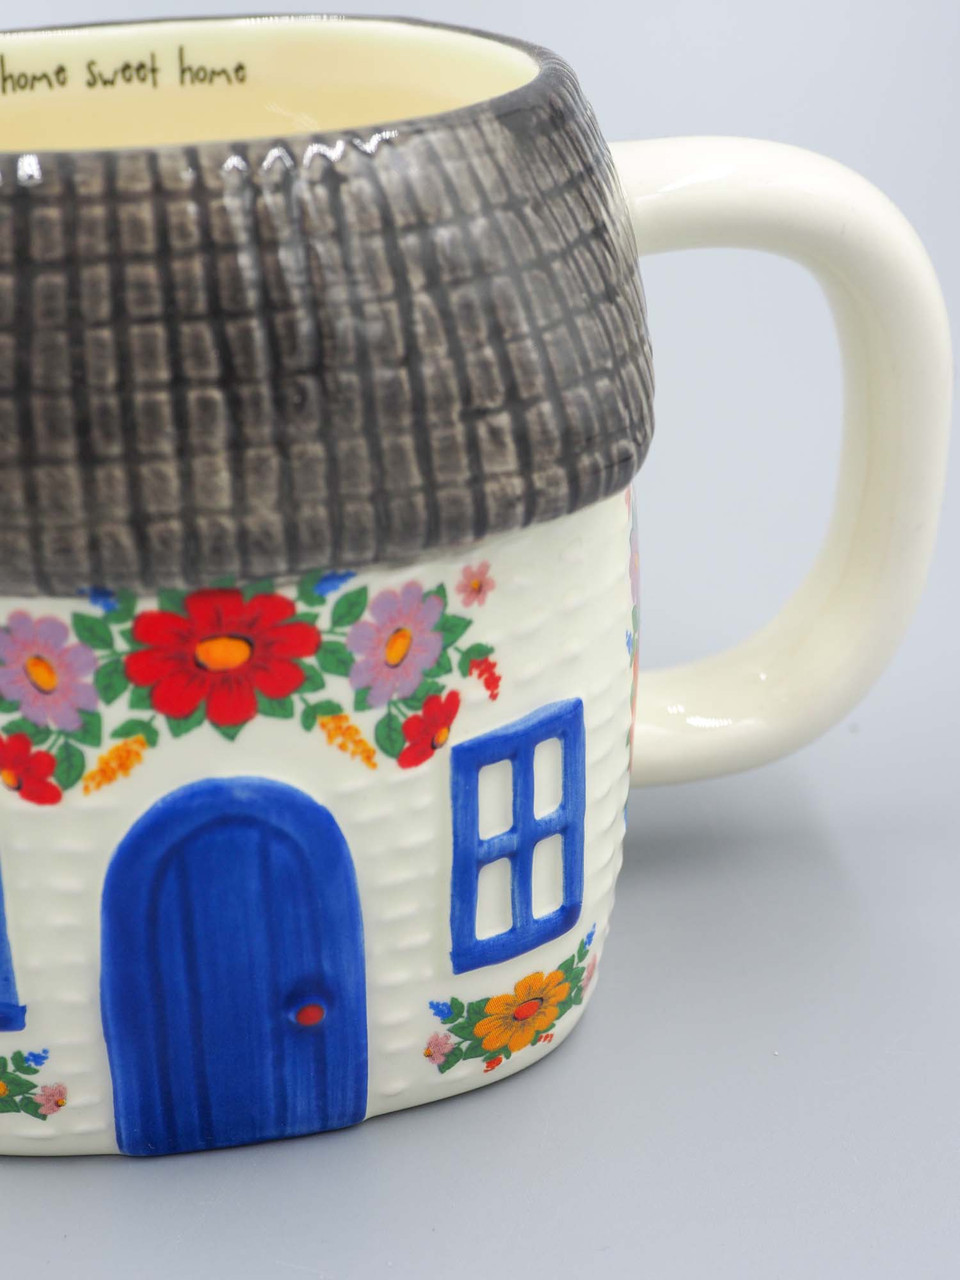 cottage mug home sweet home natural life